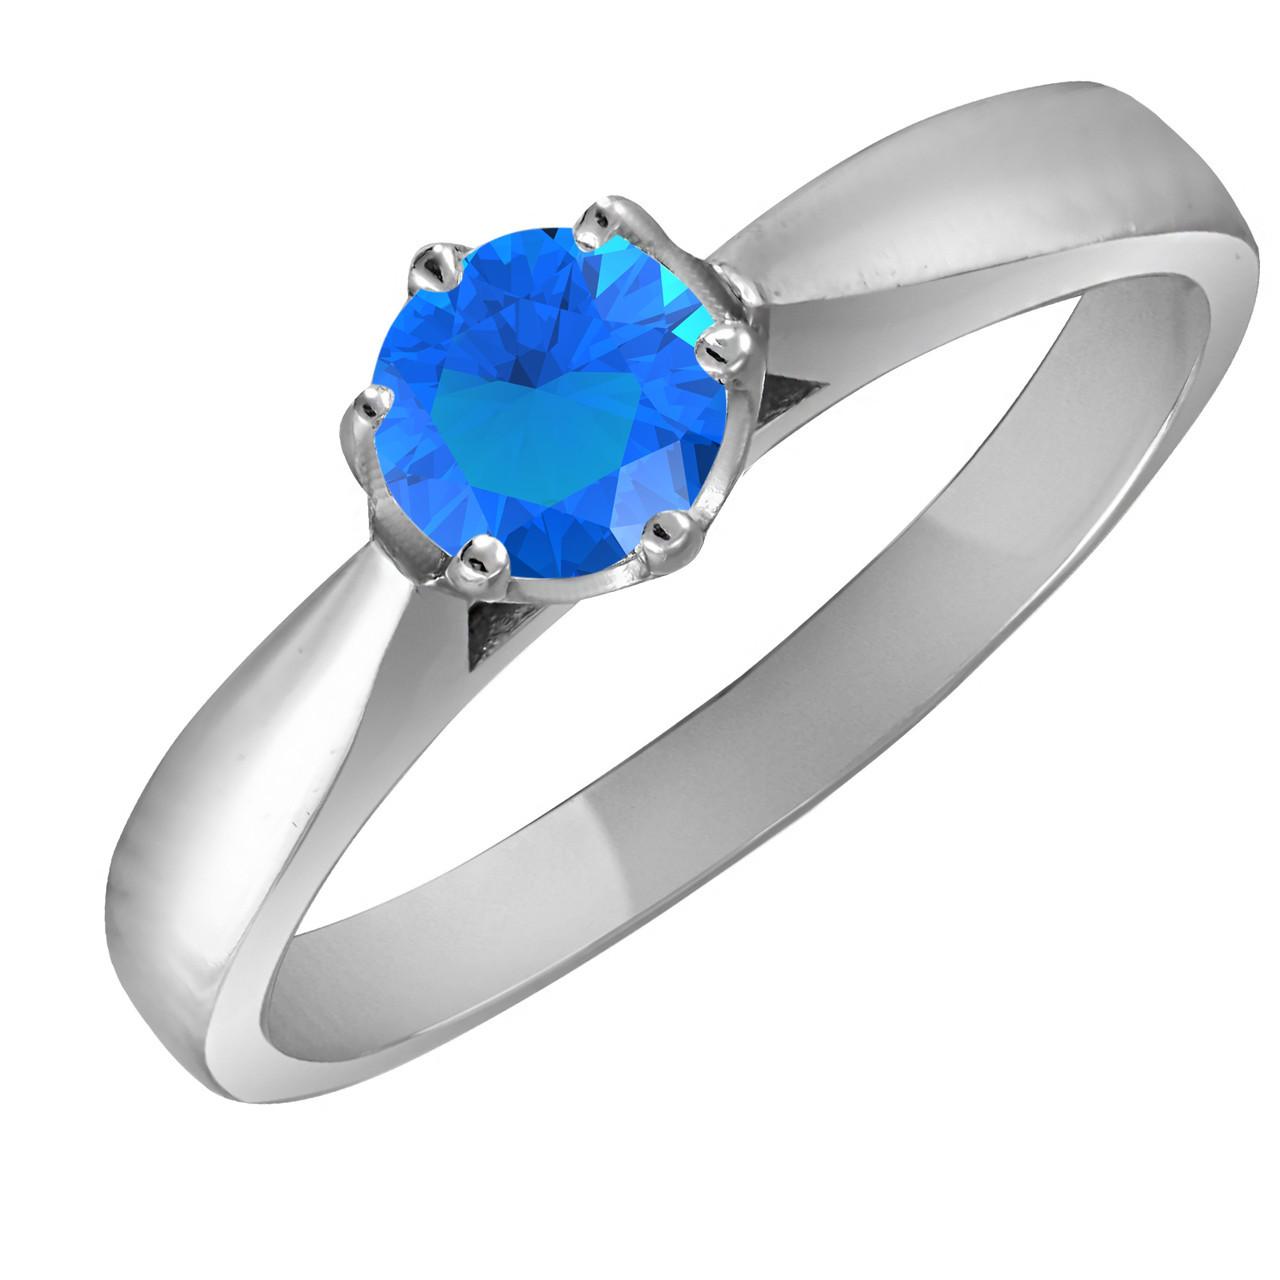 Кольцо из серебра с голубым кубическим цирконием Twiddle Jewelry 18.0 размер (К015г-18.0)